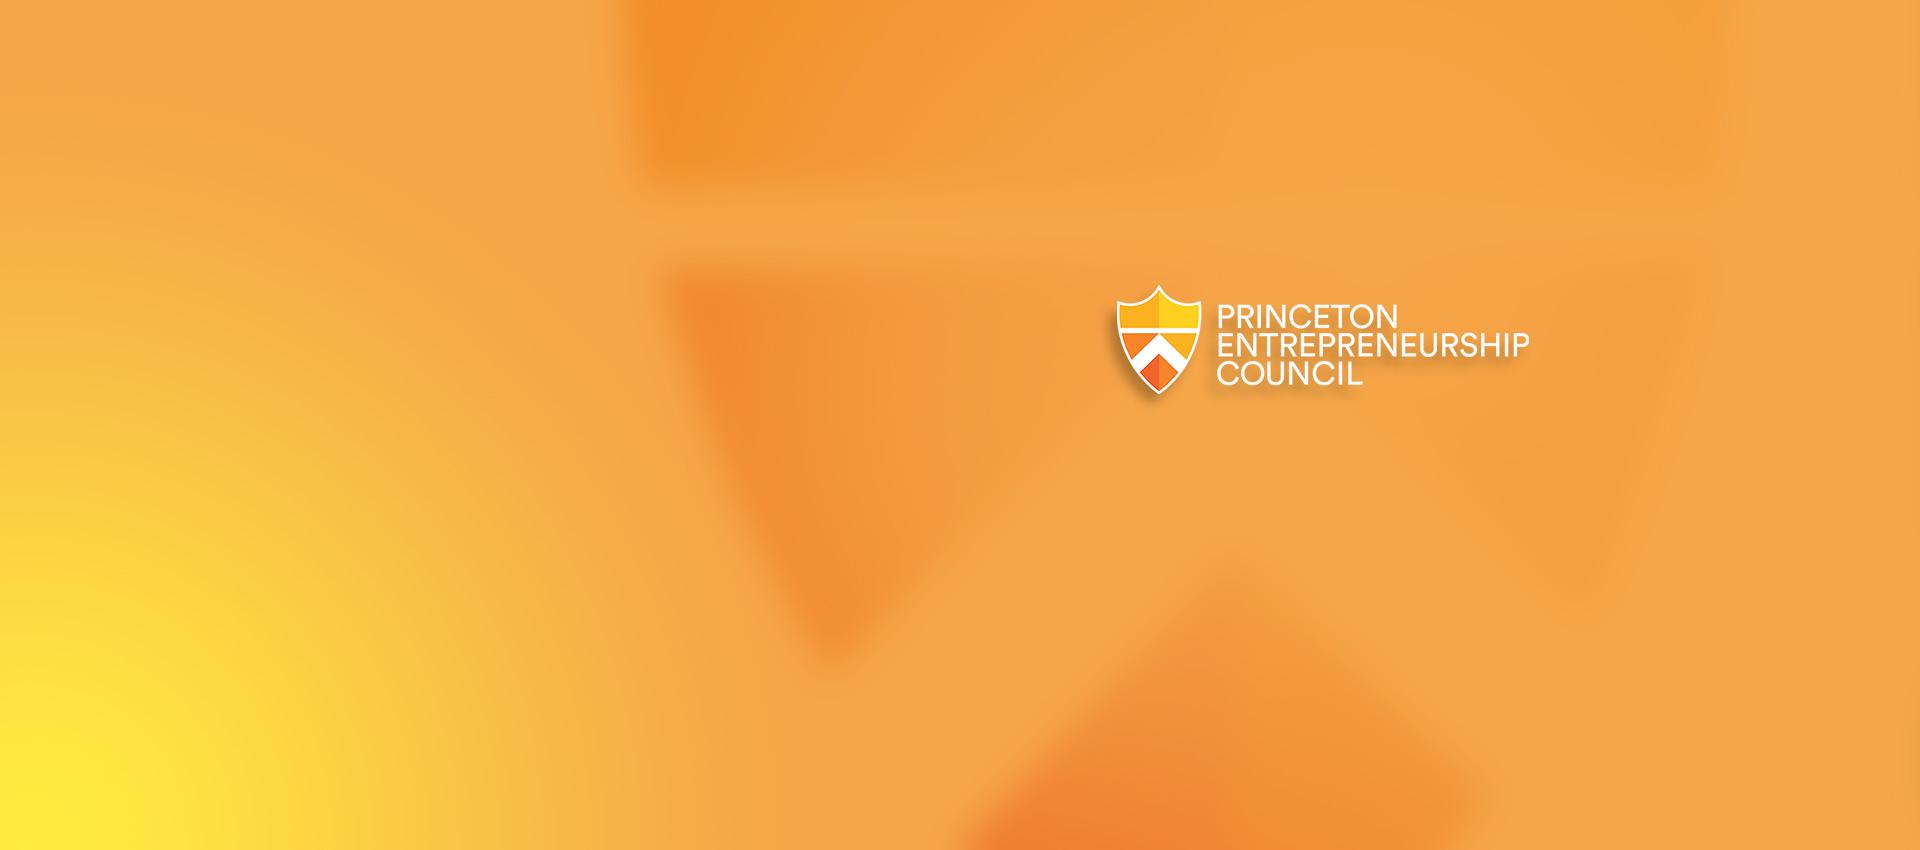 C3.ai CEO Tom Siebel gave the Princeton Entrepreneurship Conference keynote